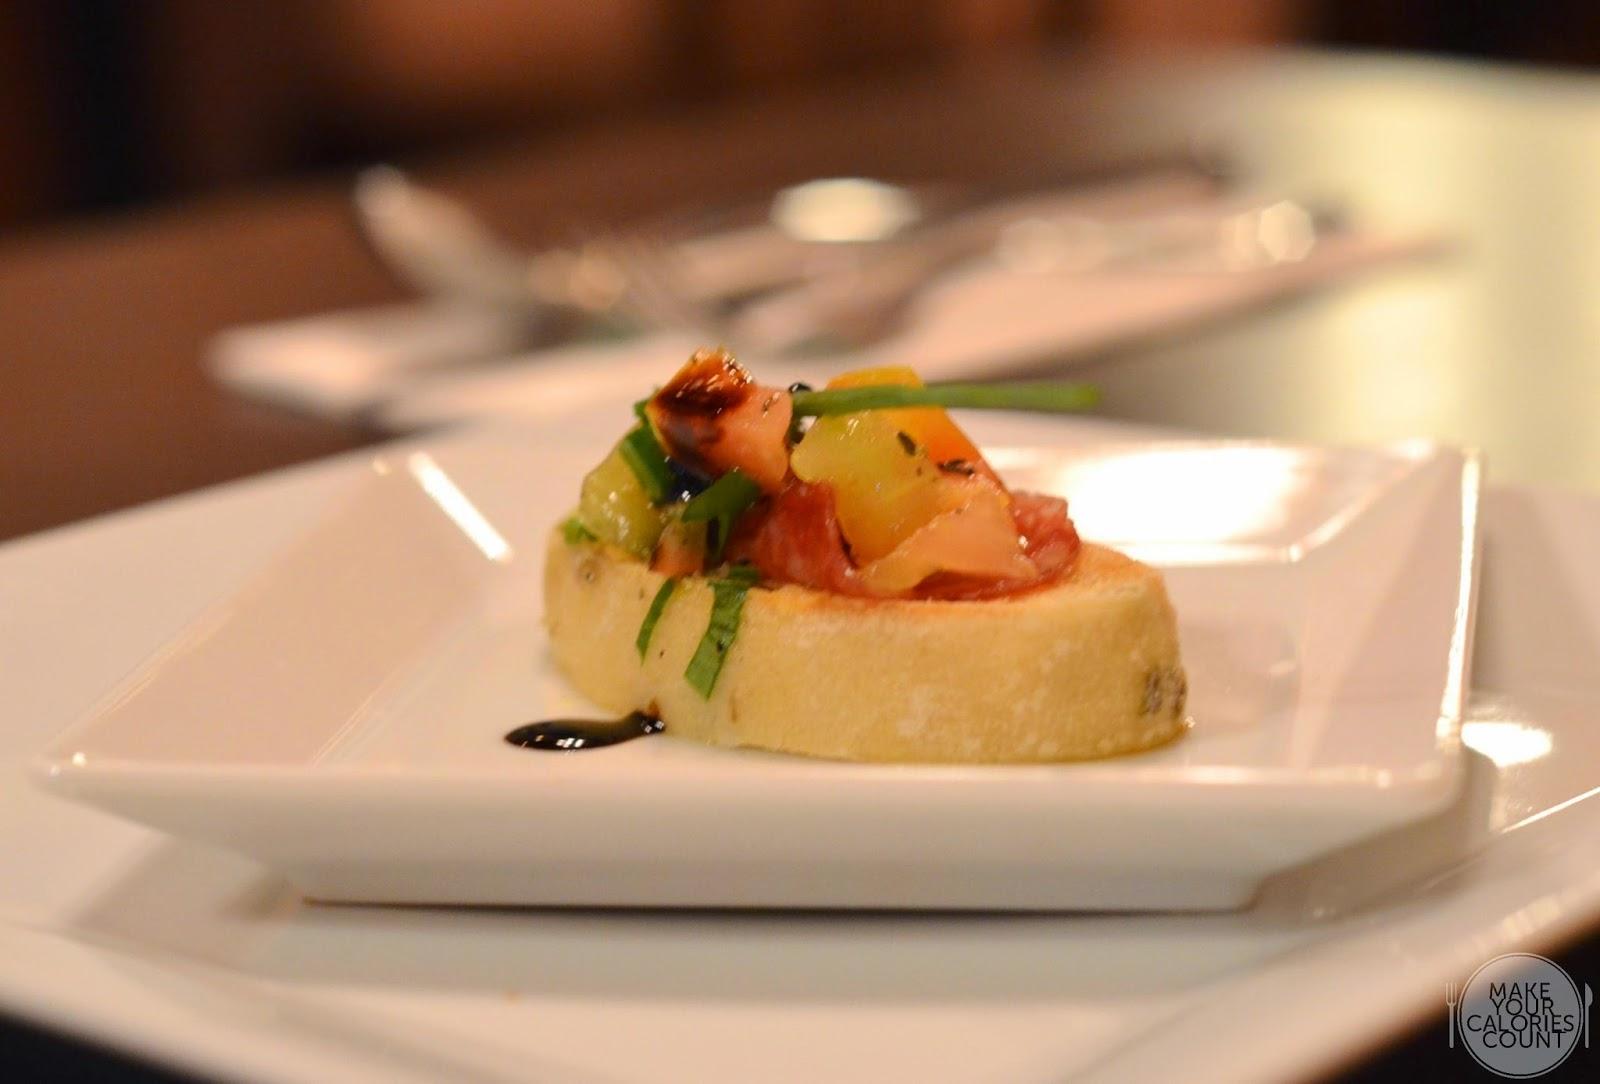 Sg trattoria gallo d 39 oro an artistic flair marking finesse in italian cuisine mycc - Amuse gueule italien ...